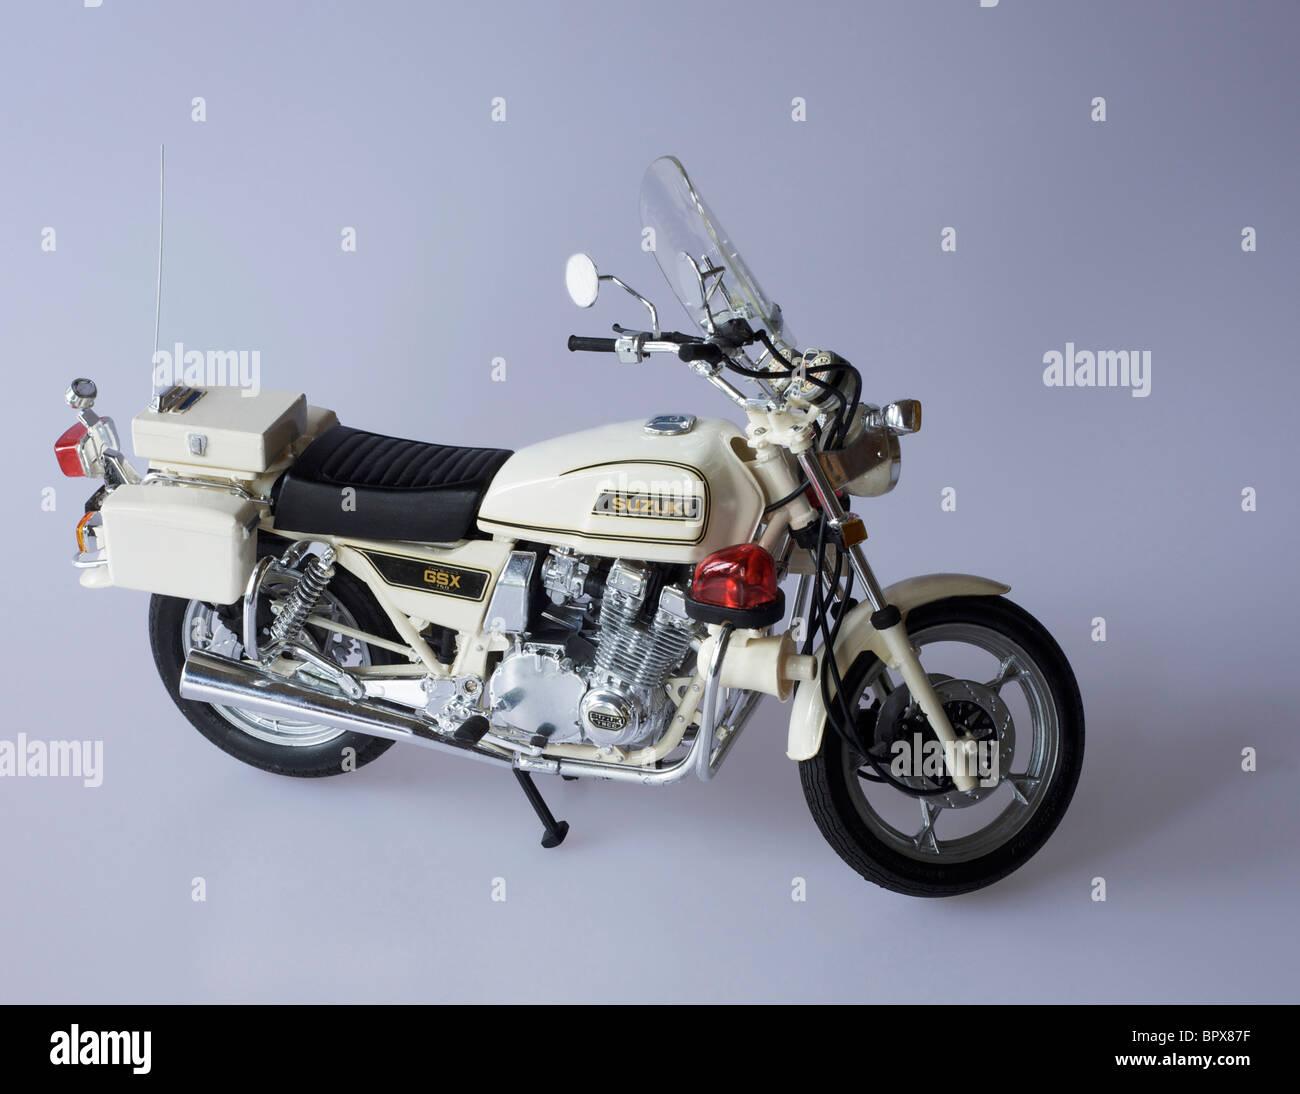 hand built  brush painted plastic construction kit by Tamiya of Suzuki 750cc Japanese police motorcycle - Stock Image